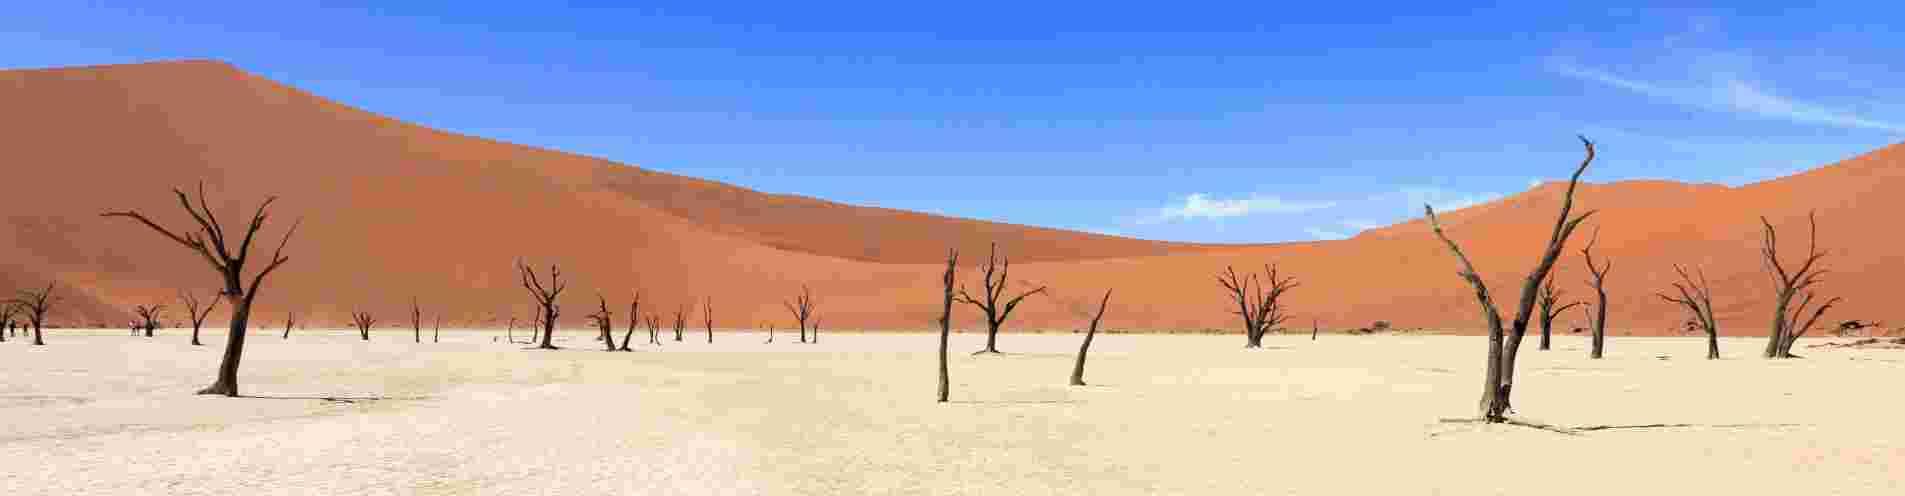 Namibia header image